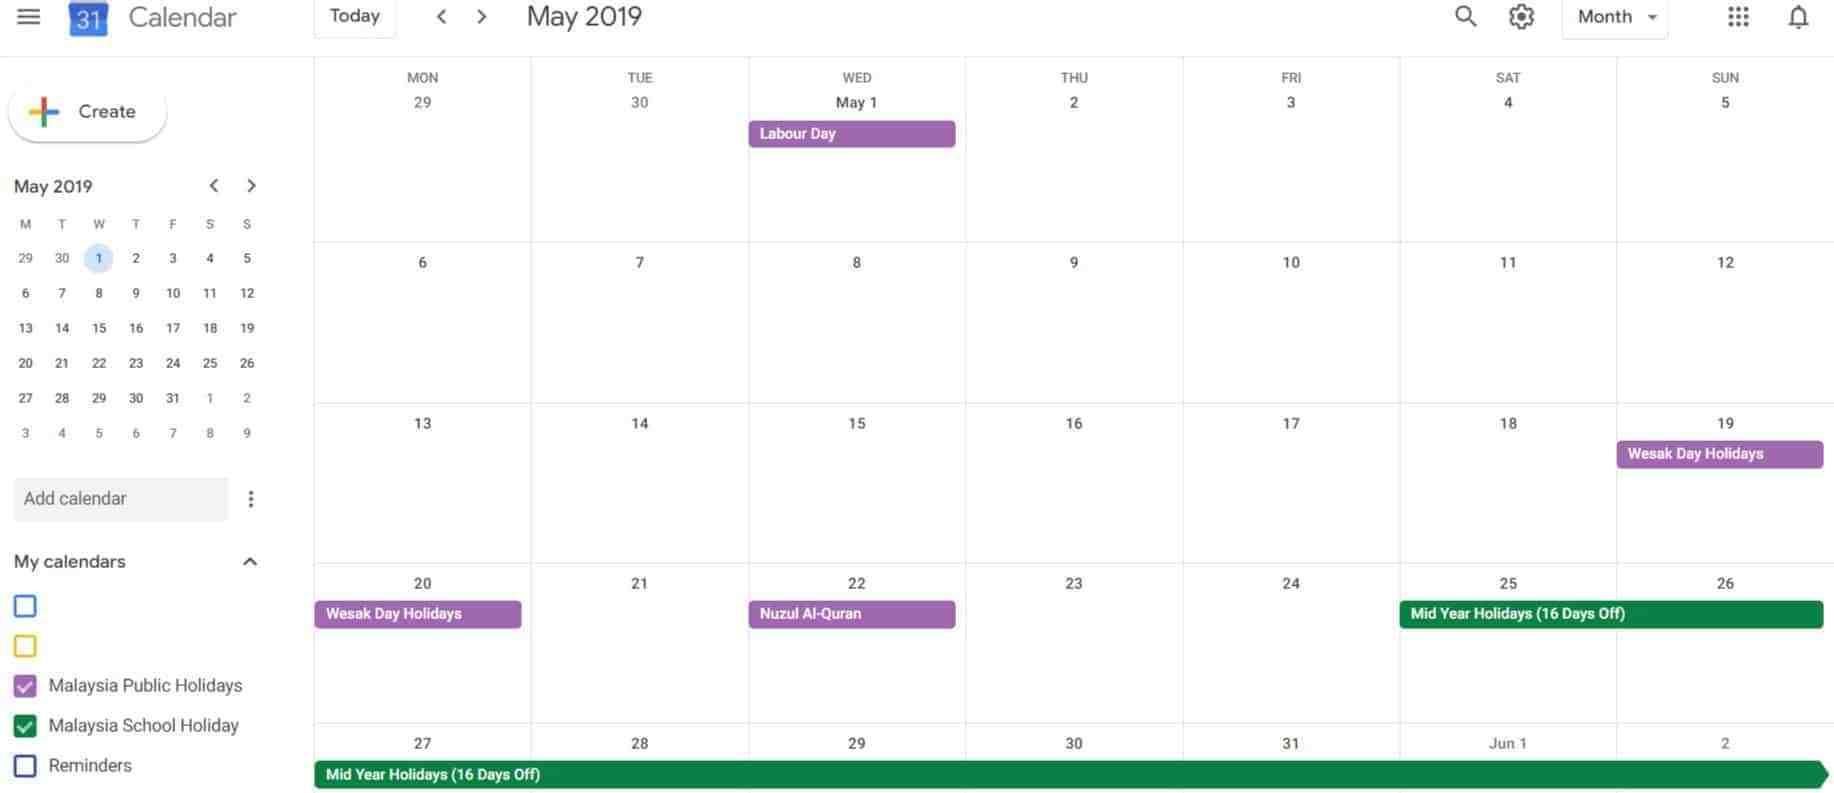 Bangla Calendar 2019 Pdf  Google Search intended for Berkeley 2020-2020 Calendar